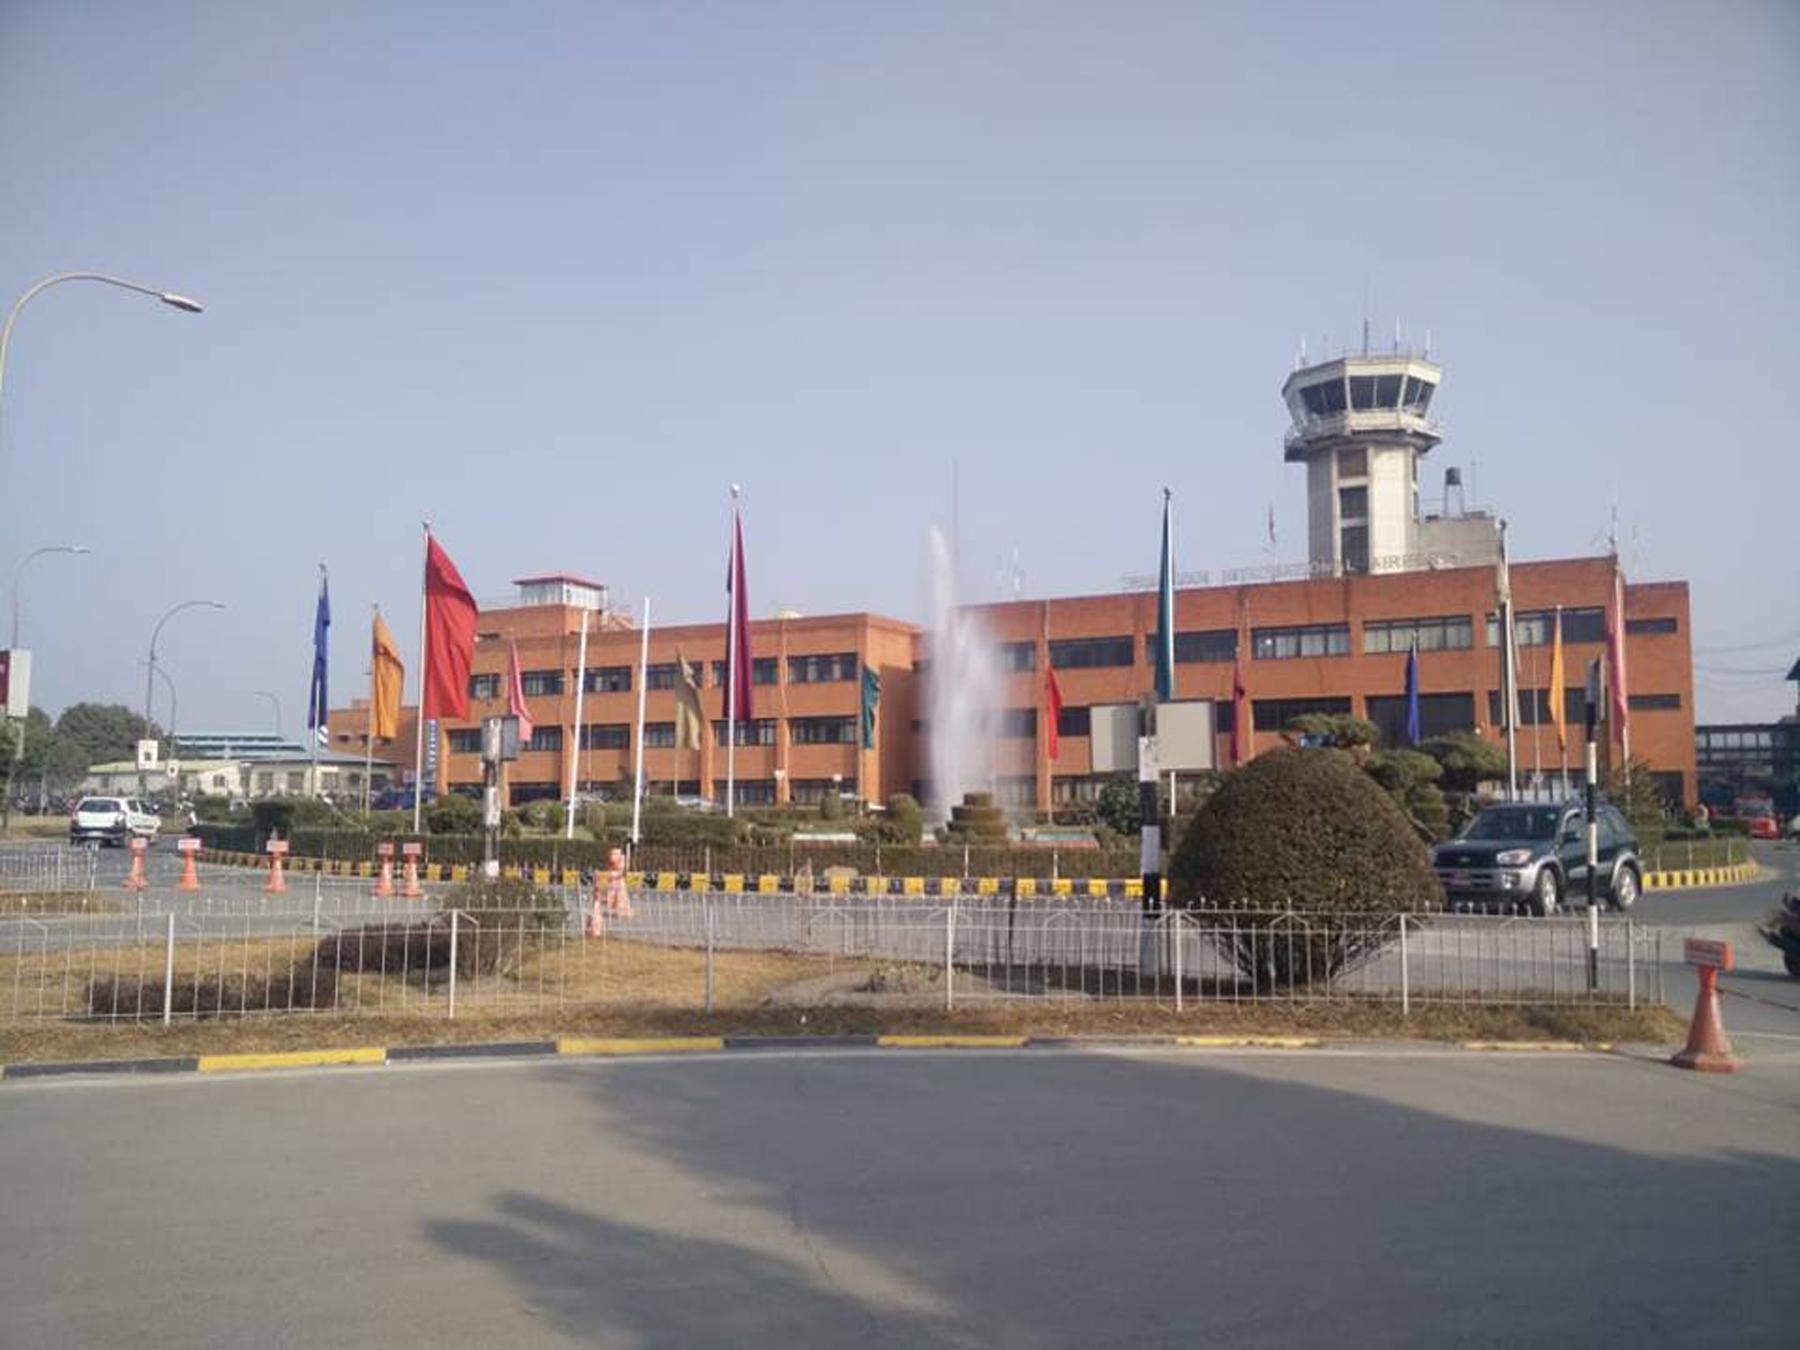 दुई सुटकेस नक्कली भारुसहित ३ पाकिस्तानी नागरिक त्रिभुवन विमानस्थलबाट पक्राउ